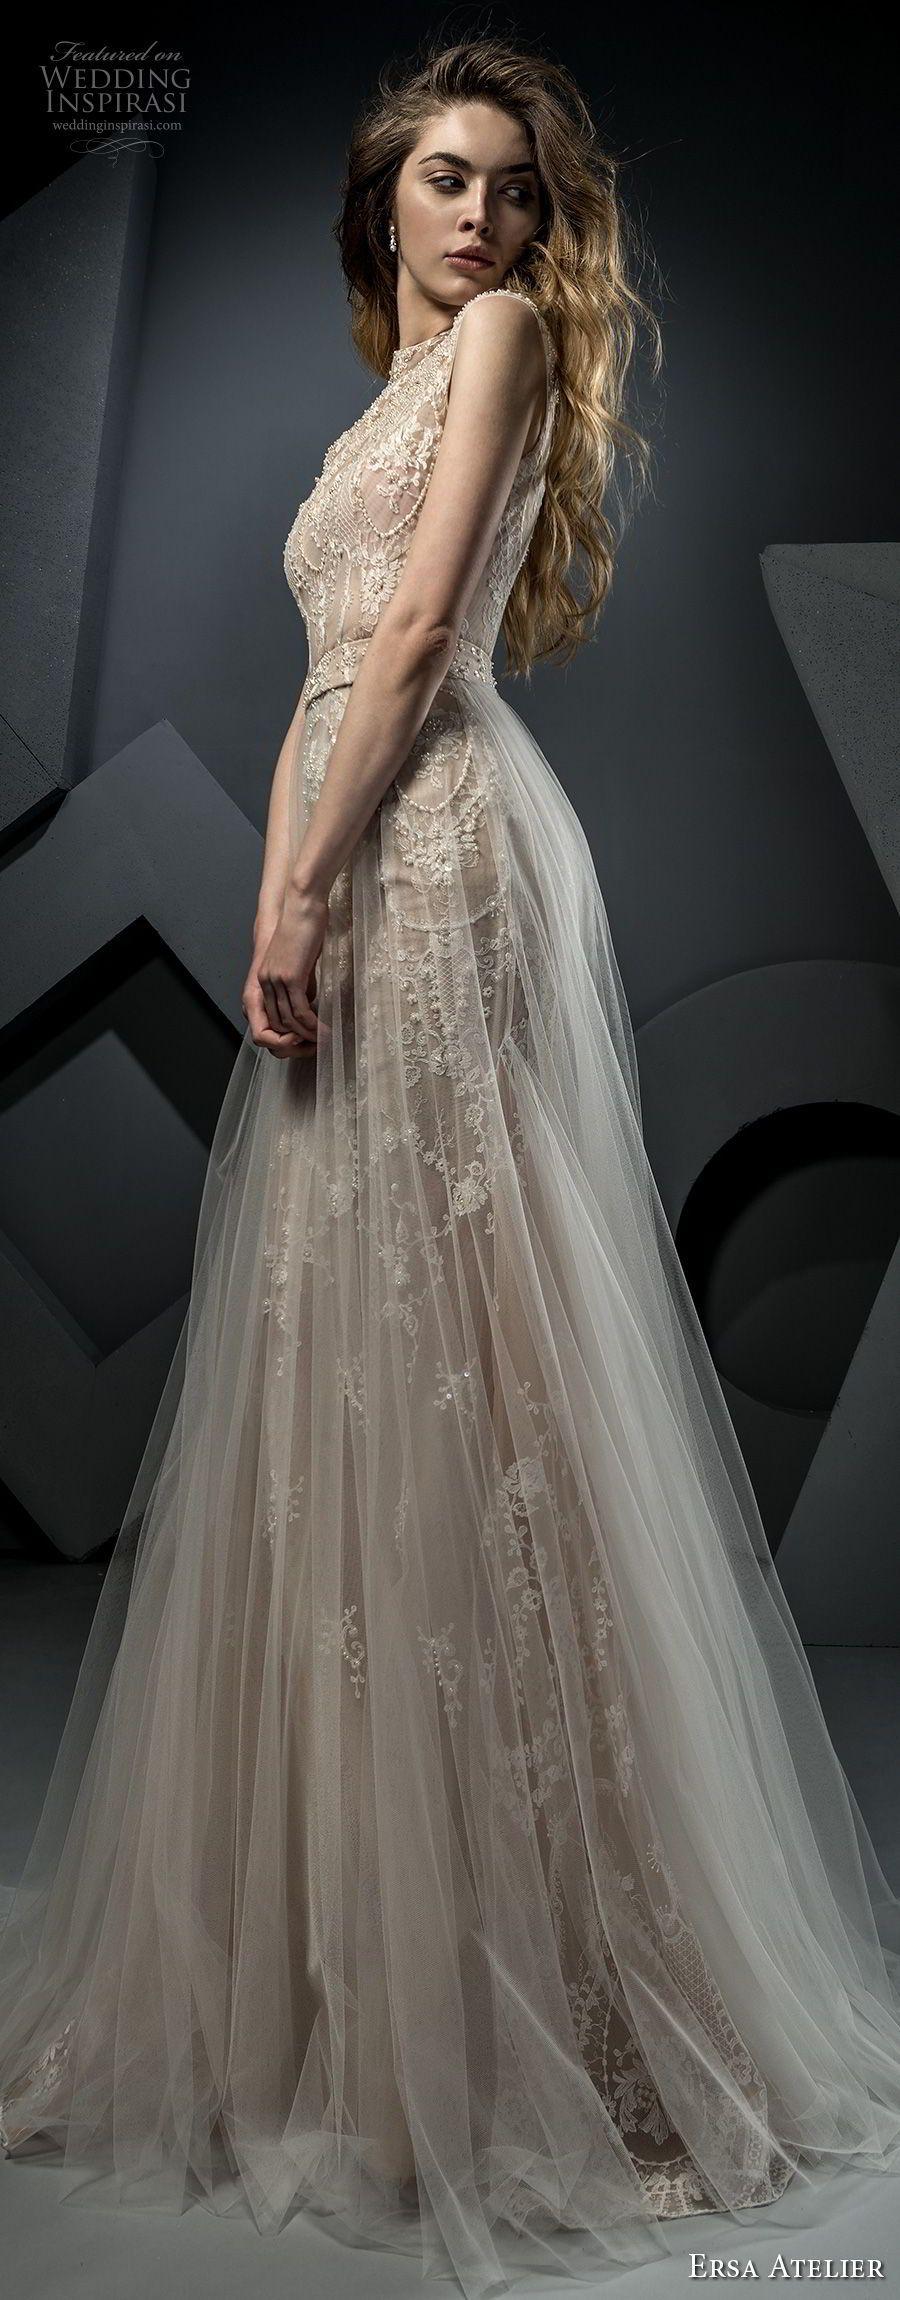 Ersa atelier spring wedding dresses u ucmiss mistud bridal